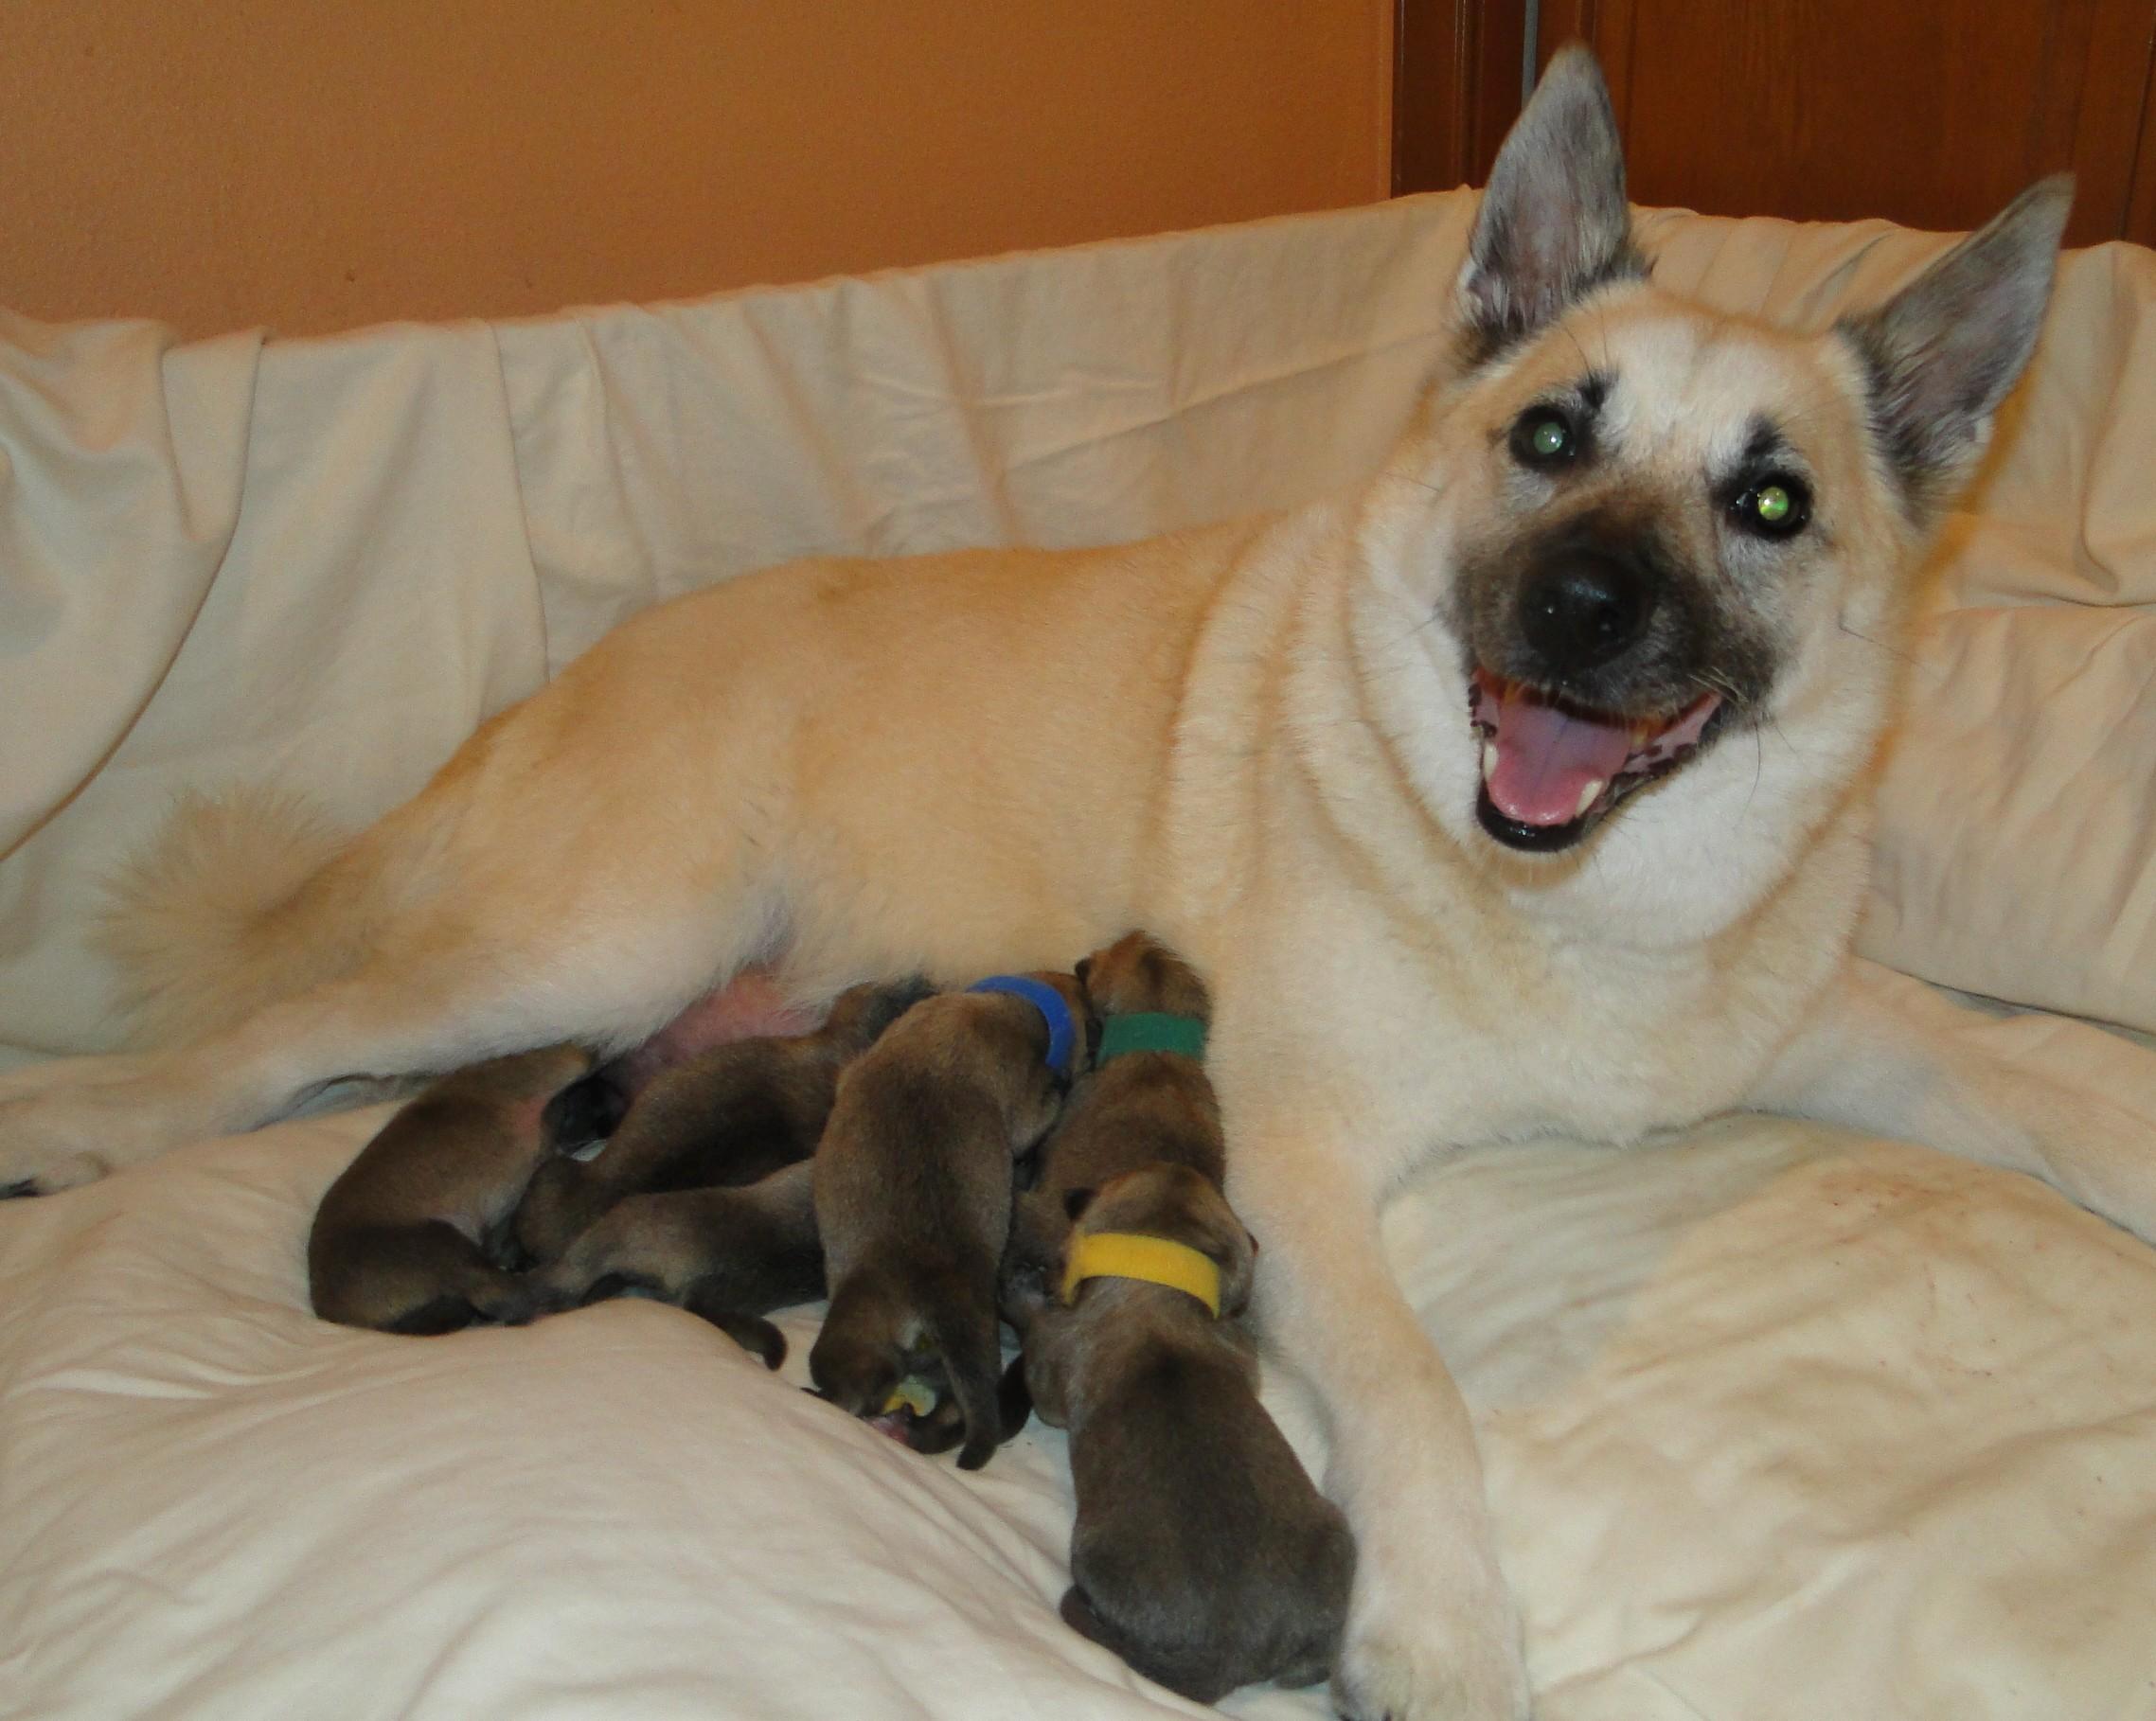 Norwegian Buhund Puppies Jotunn Buhunds G Litter